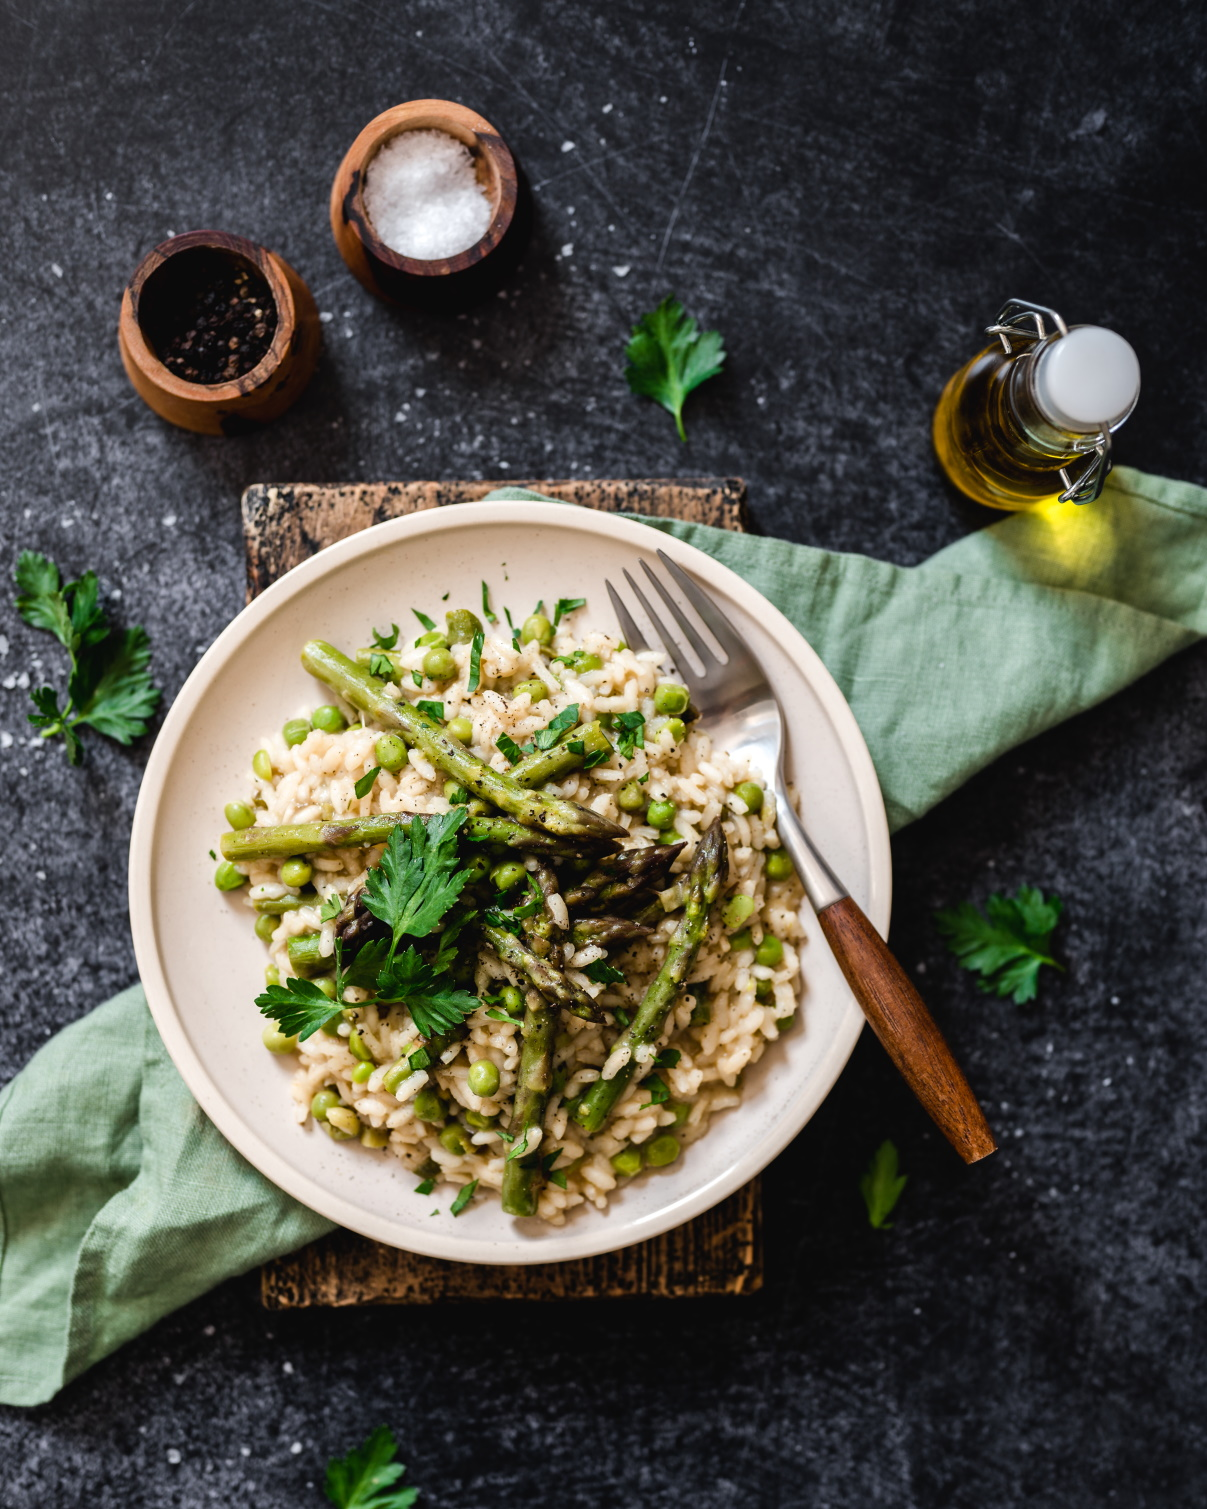 Lente risotto met groene asperges en zwarte knoflook